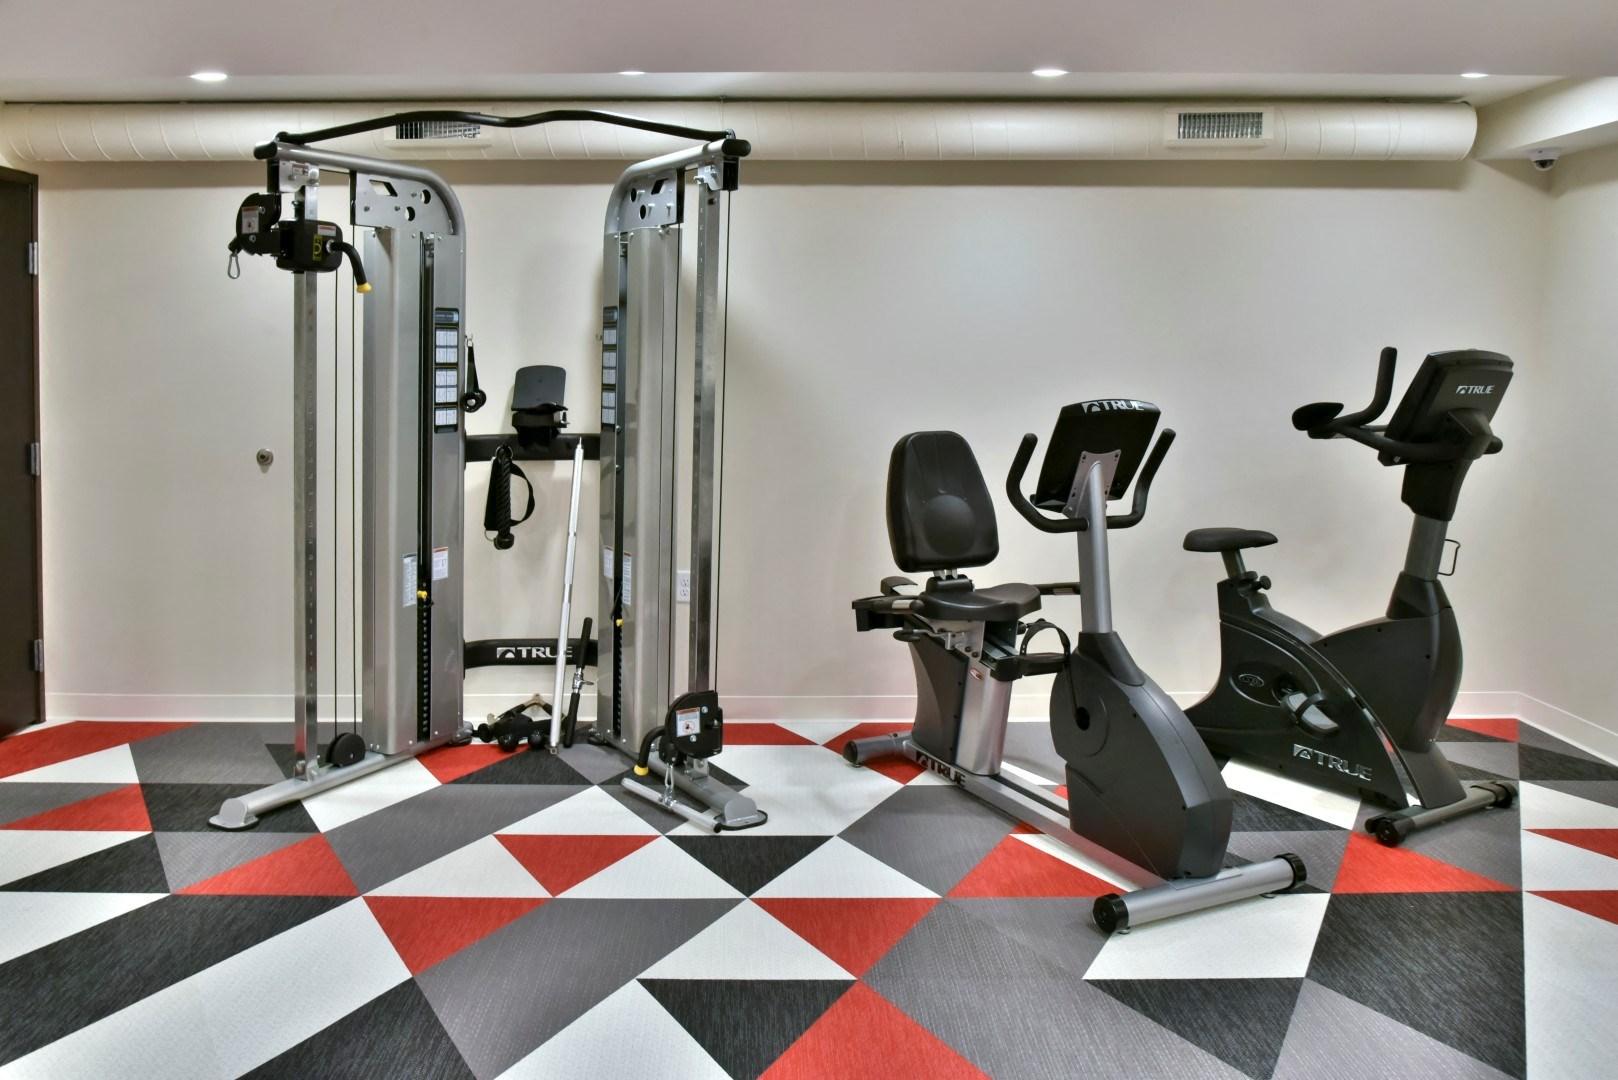 Workout Equipment at Eagan Place Apartments, Eagan, MN